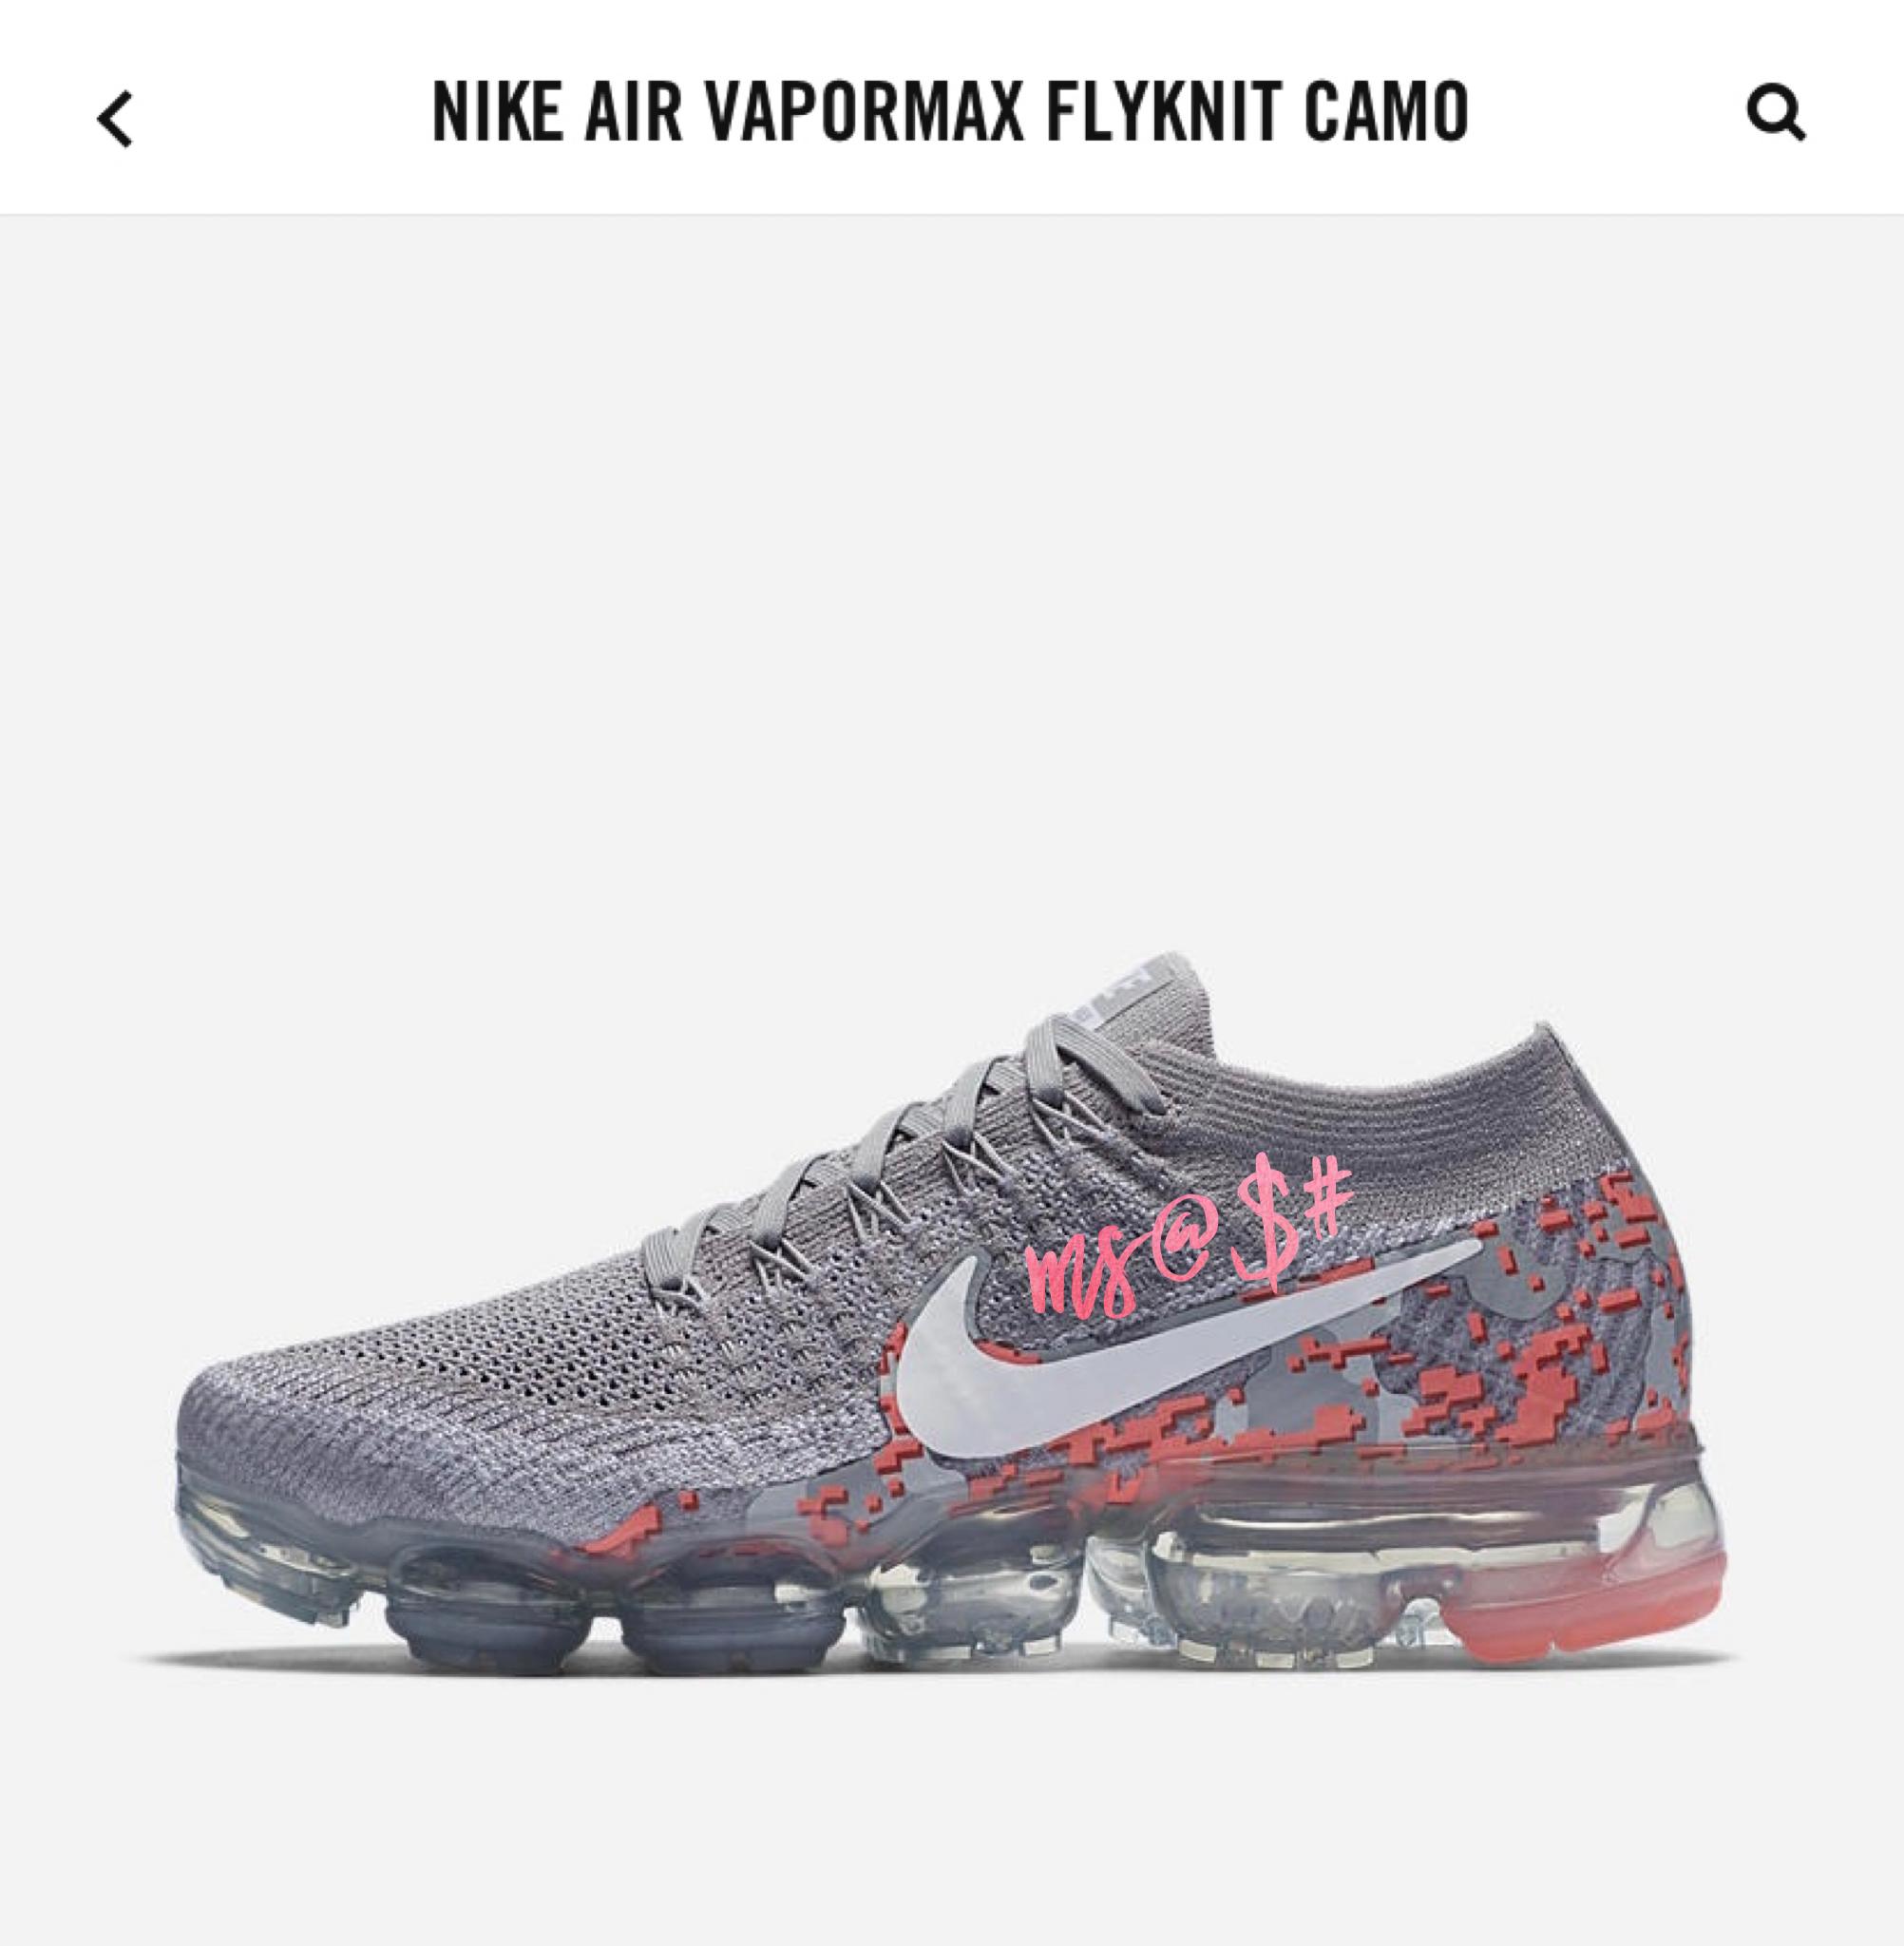 variable Gárgaras perdonar  Nike vapor max fly knit camo | Womens sneakers, Nike air max, Nike air  vapormax